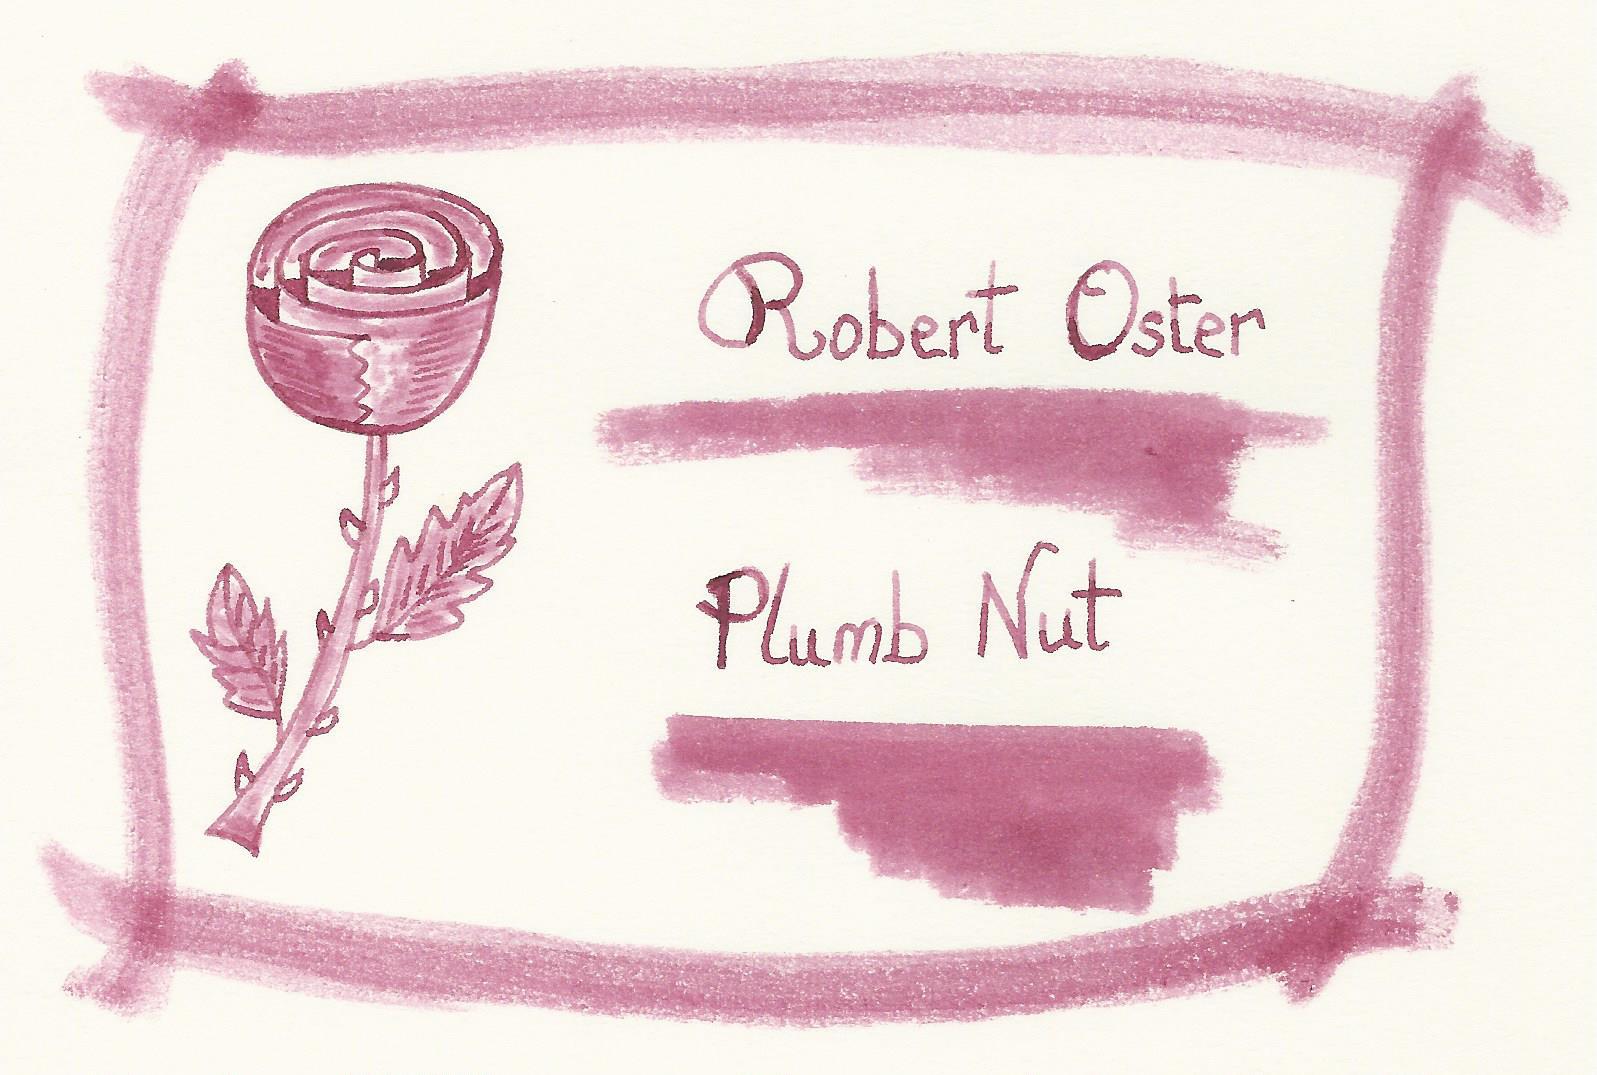 fpn_1500062820__robert_oster_-_plumb_nut